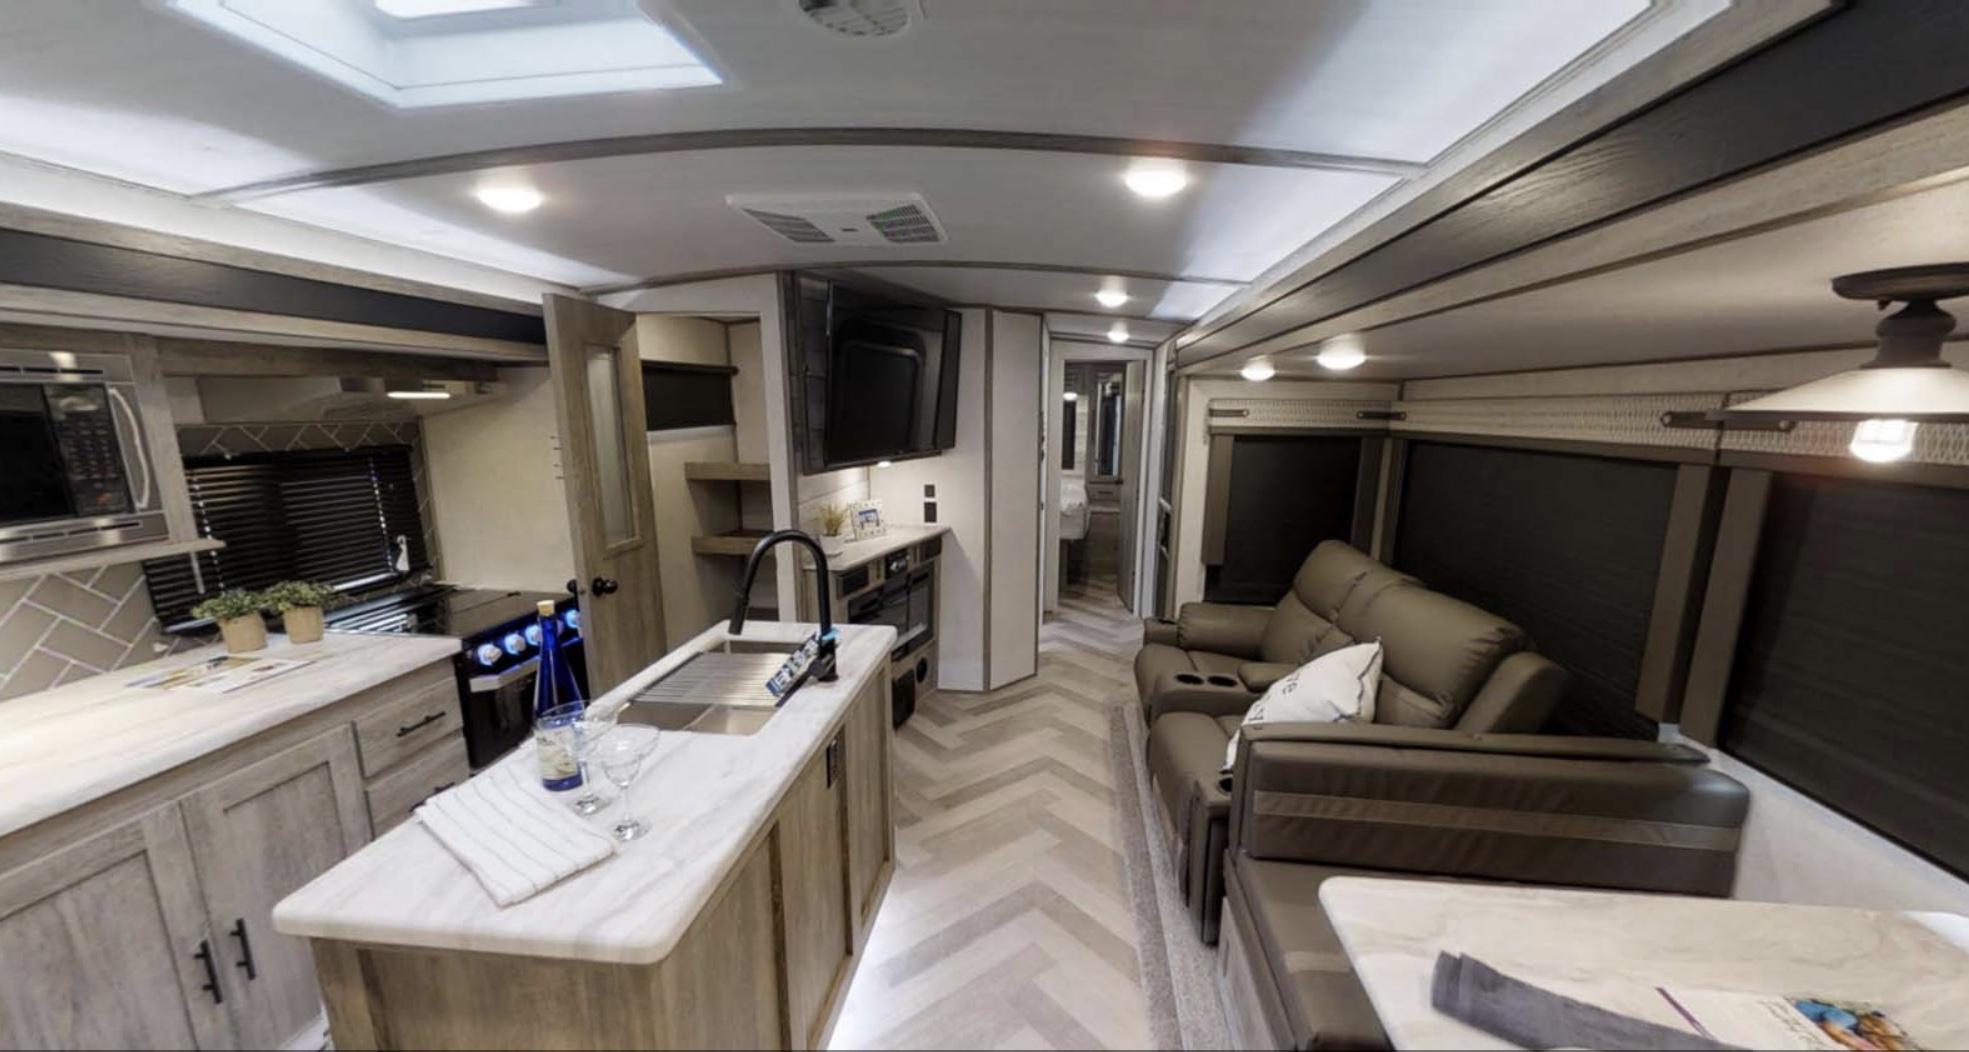 Modern kitchen and living space. Forest River Salem Hemisphere 2020